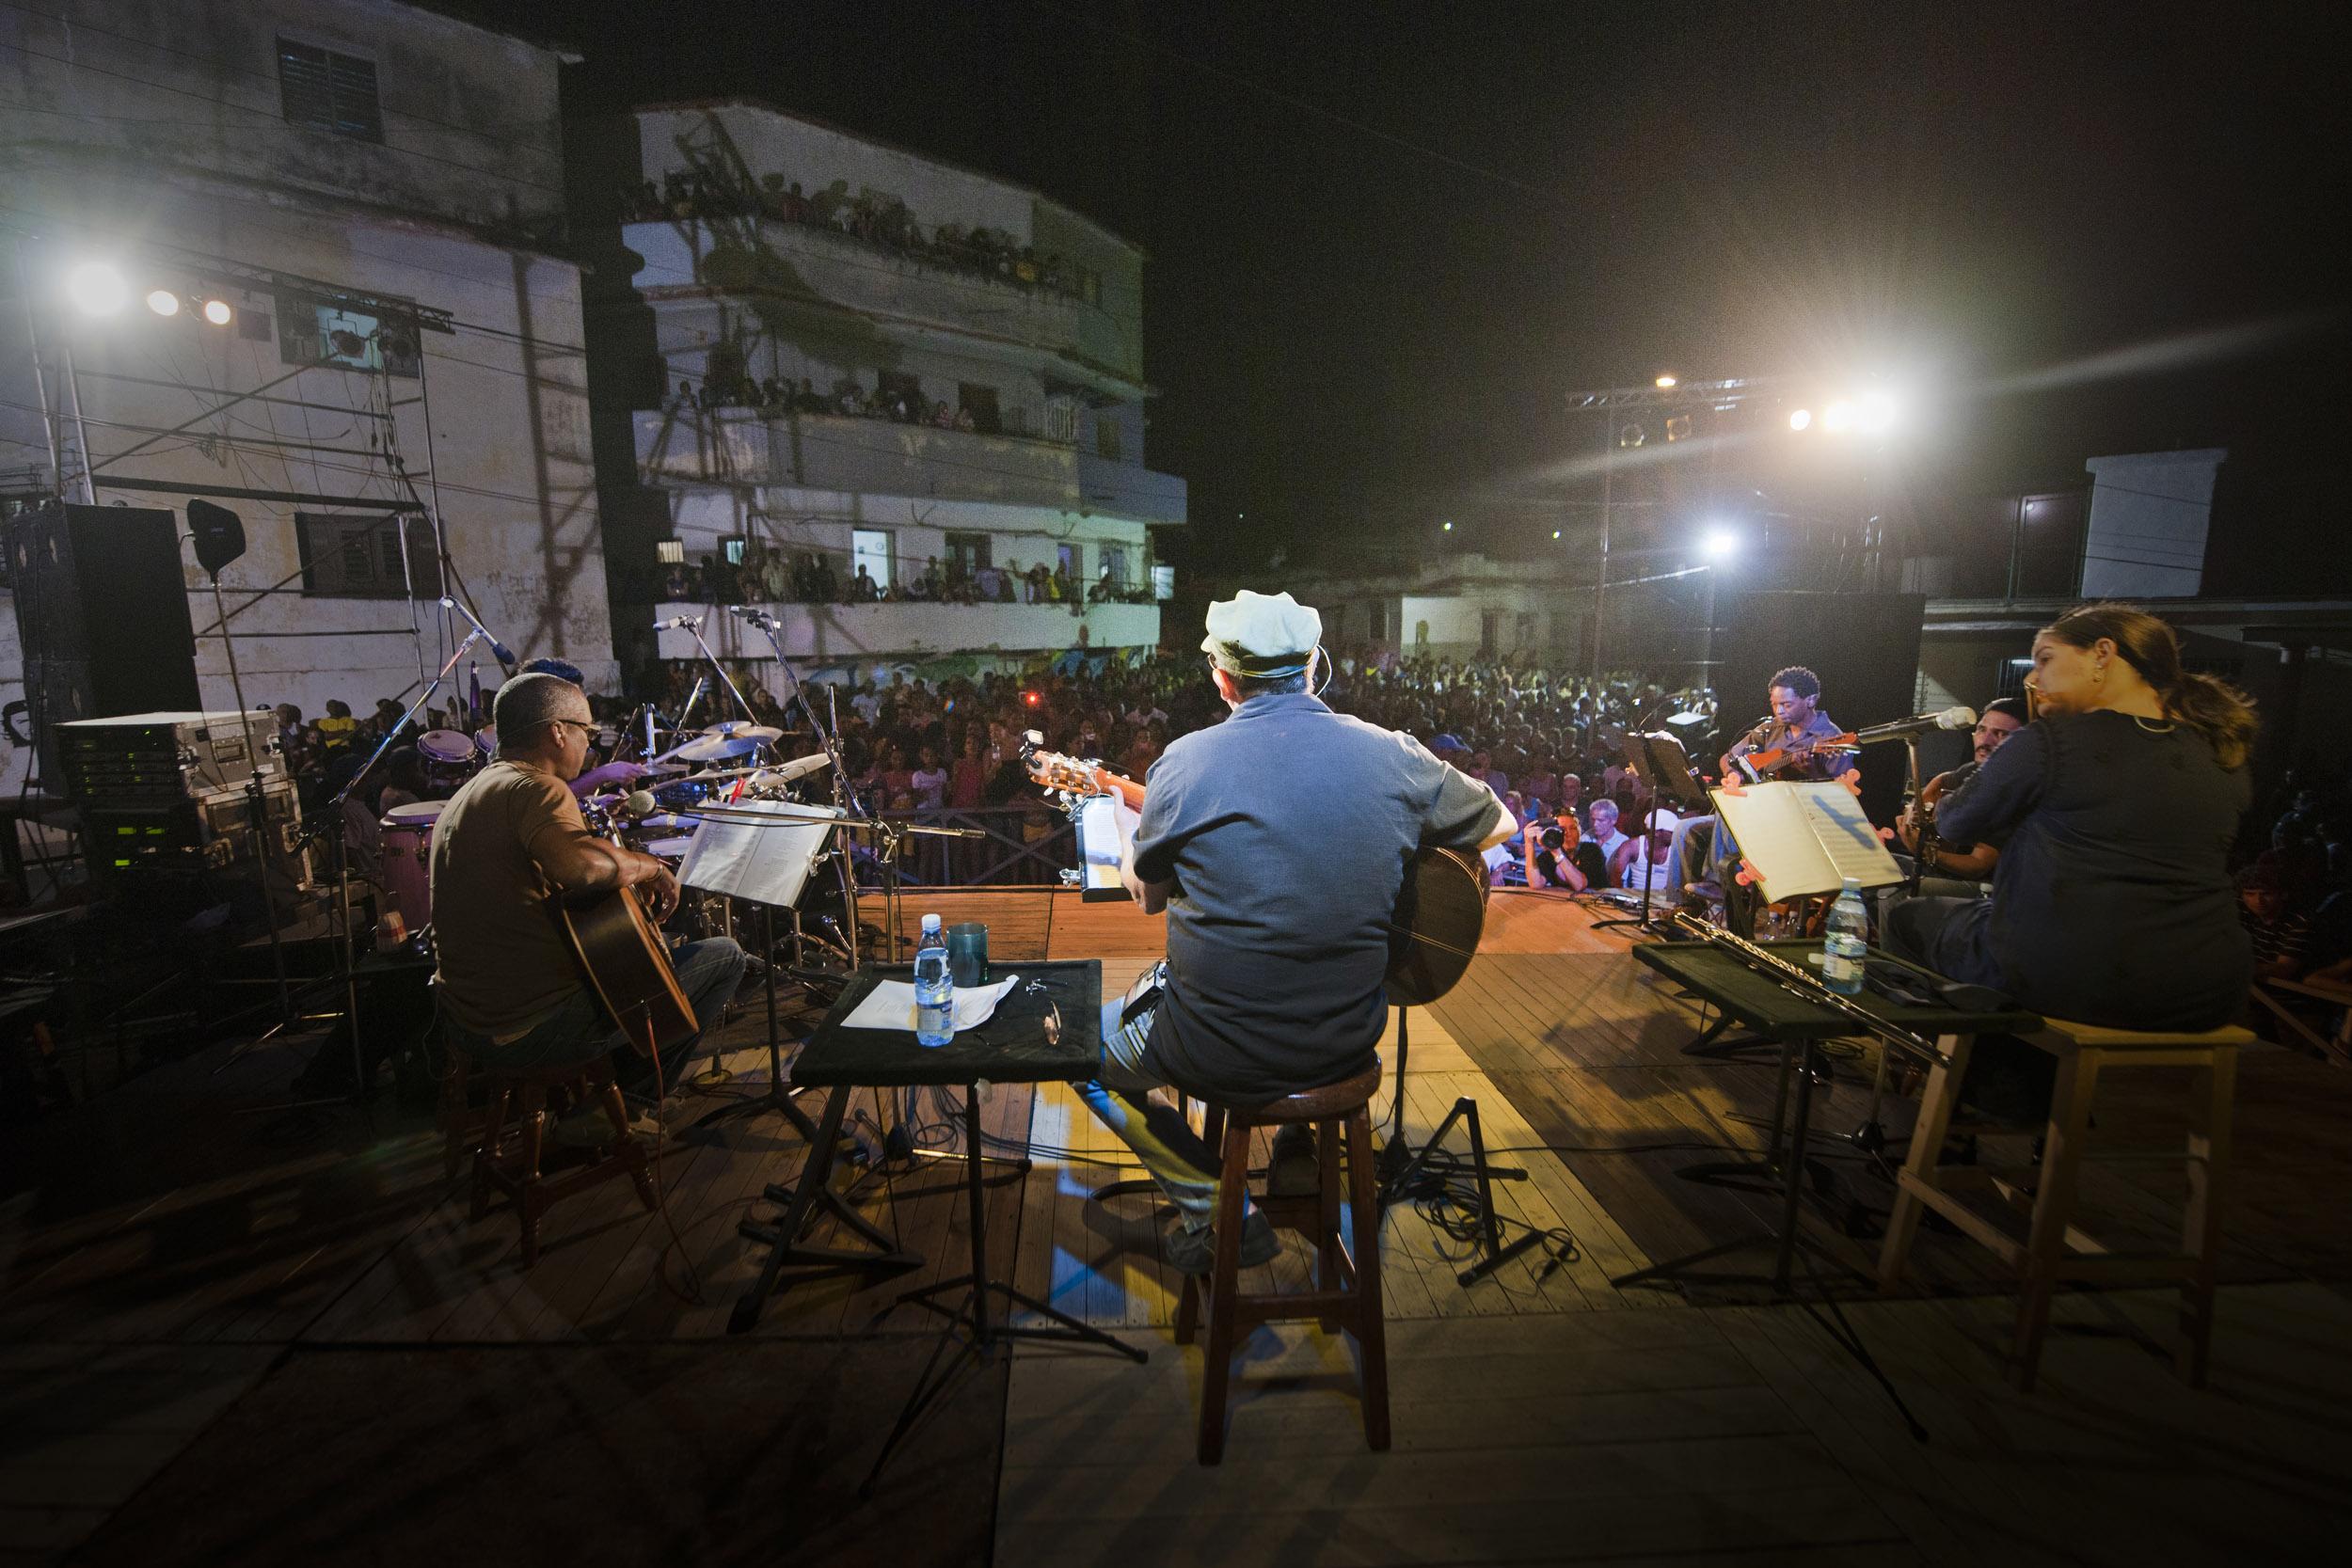 Silvio Rodriguez, musician - Illuminated Cuba - Hector Garrido, Aerial and human photography